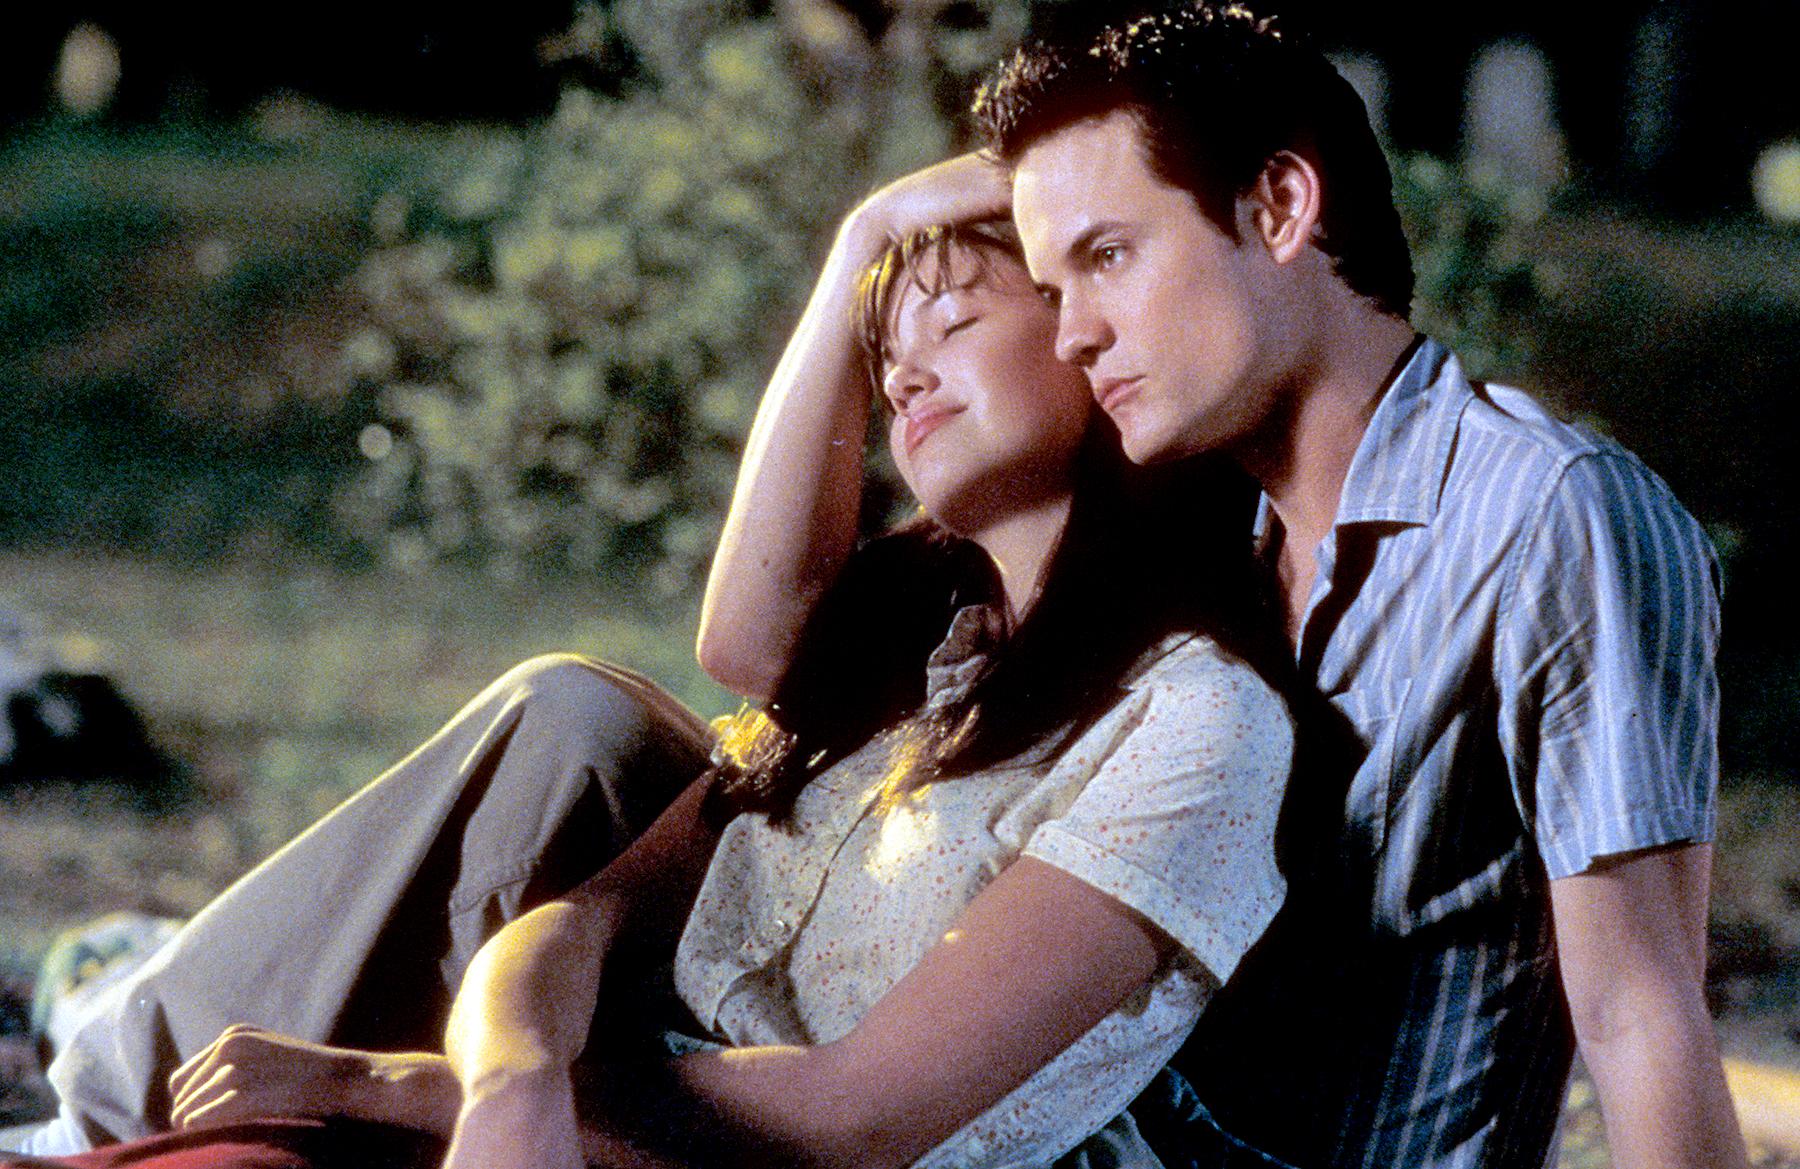 21 Film Barat Romantis Terbaik Yang Wajib Ditonton